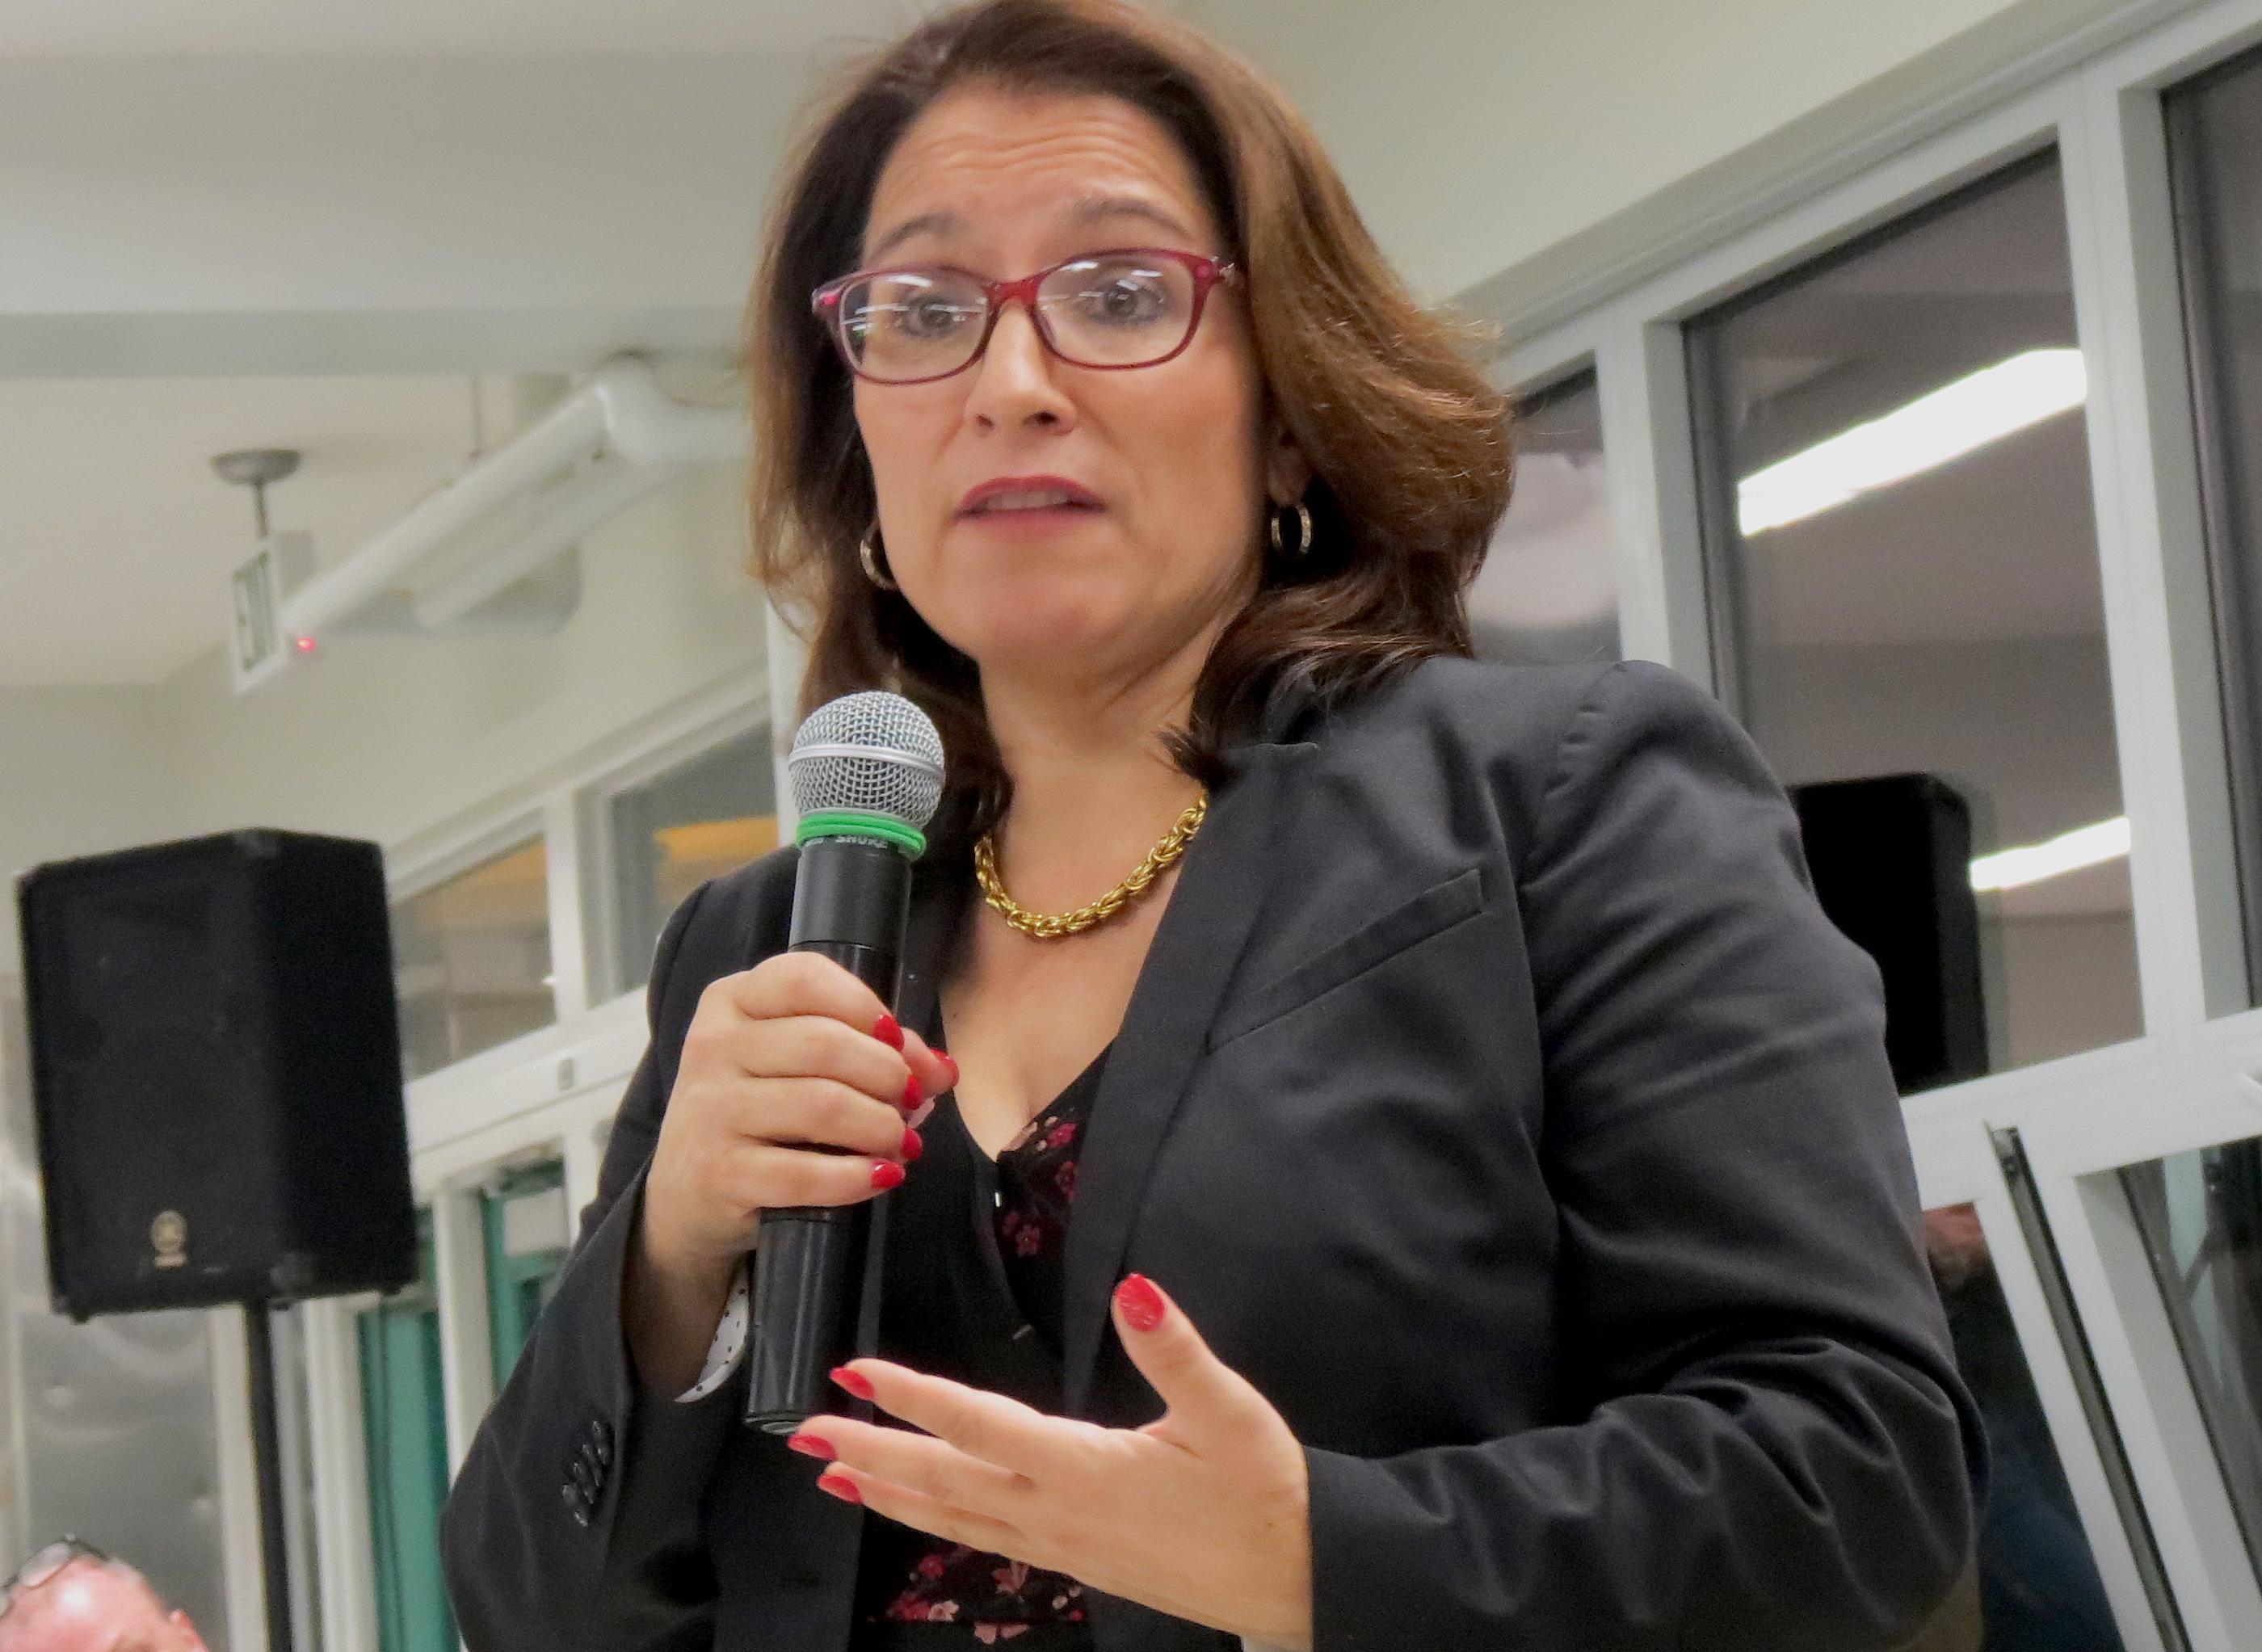 Photo: Denver Public Schools Superintendent Susana Cordova